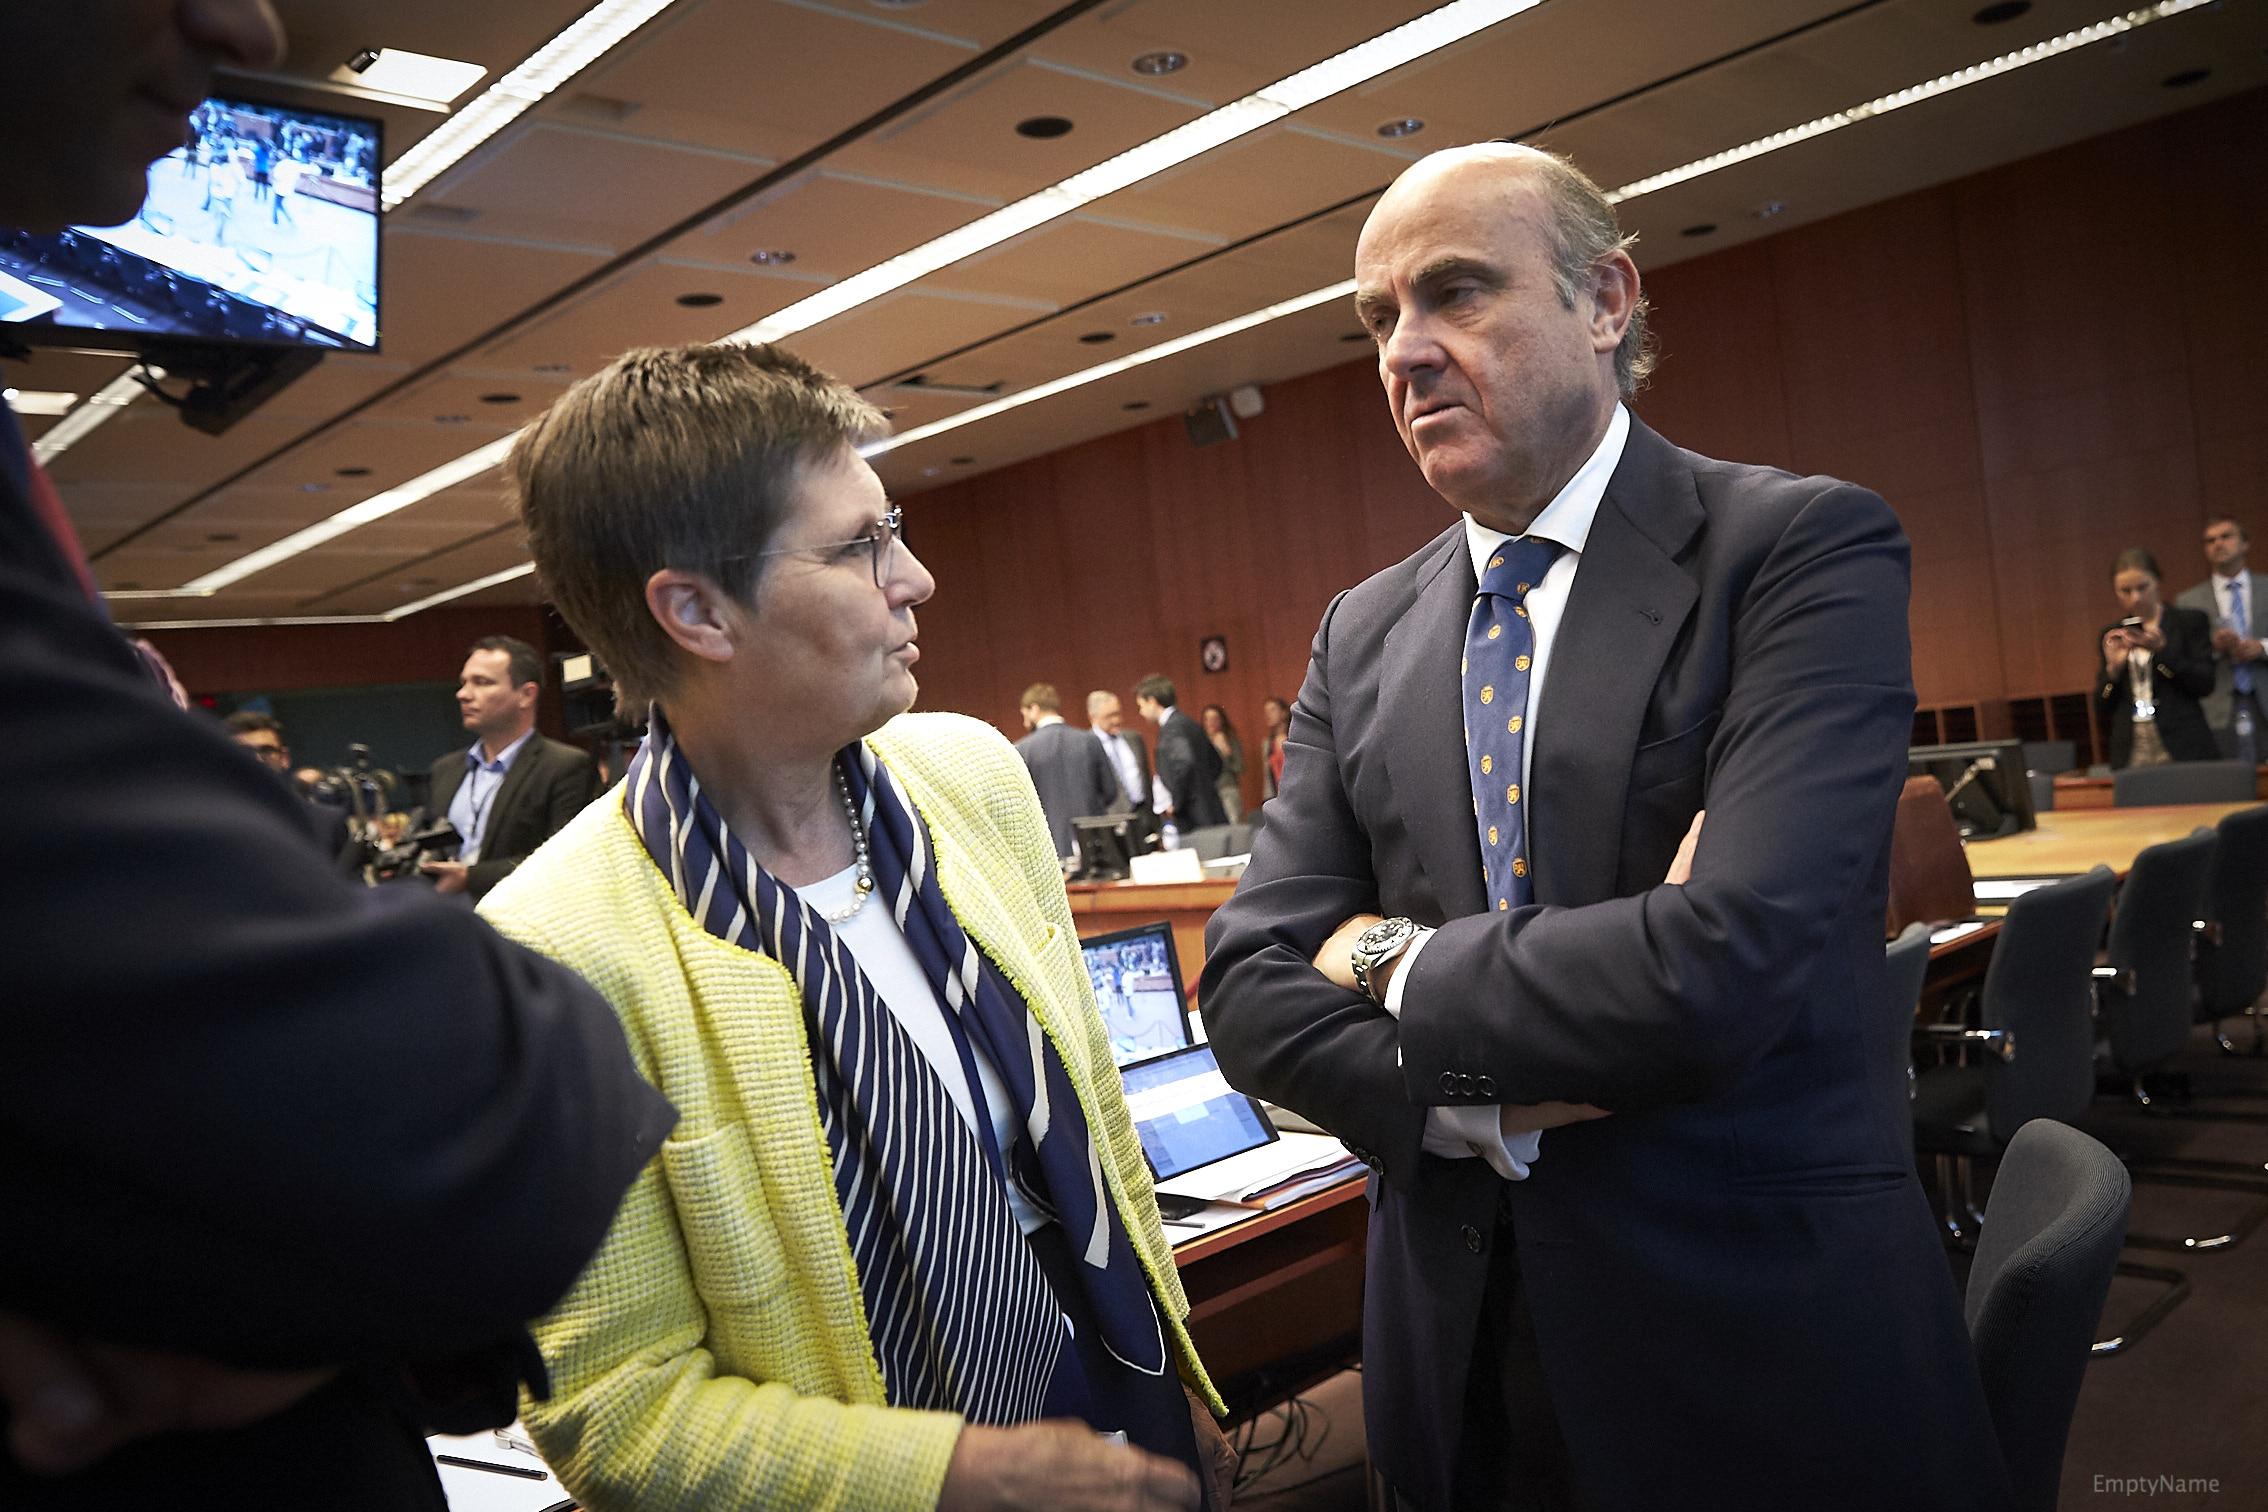 Spain S De Guindos To Be Ecb Vice President